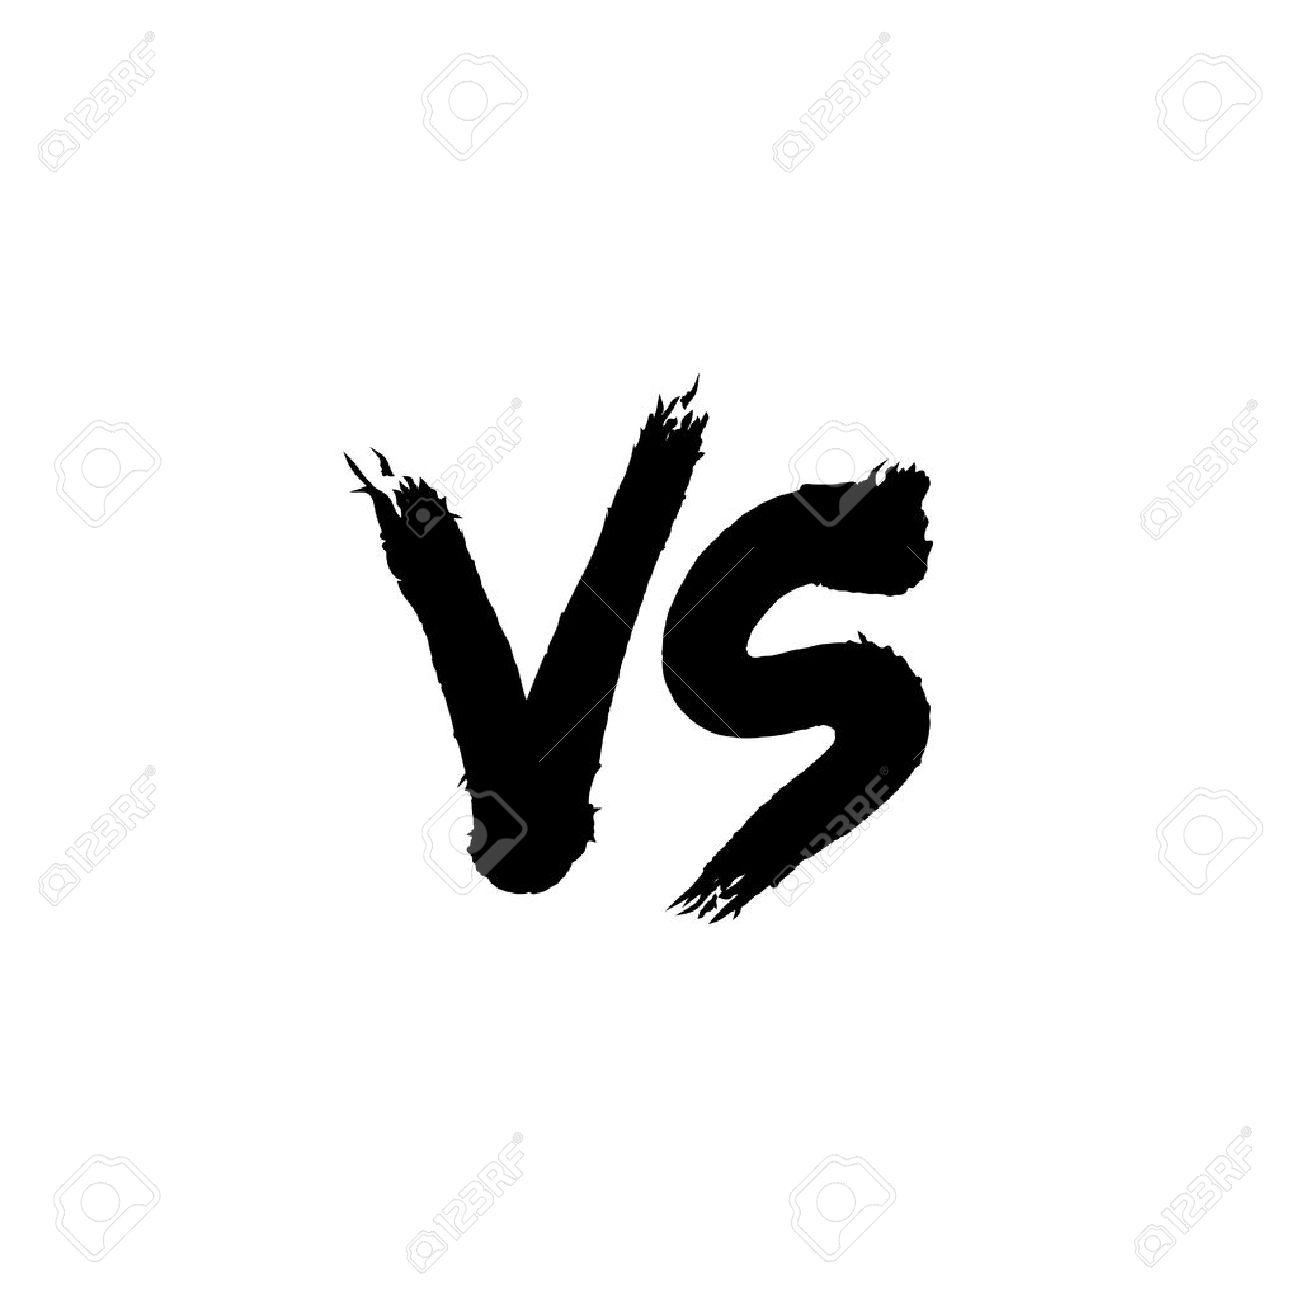 Symbol Competition Vs Vector Illustration Stock Vector